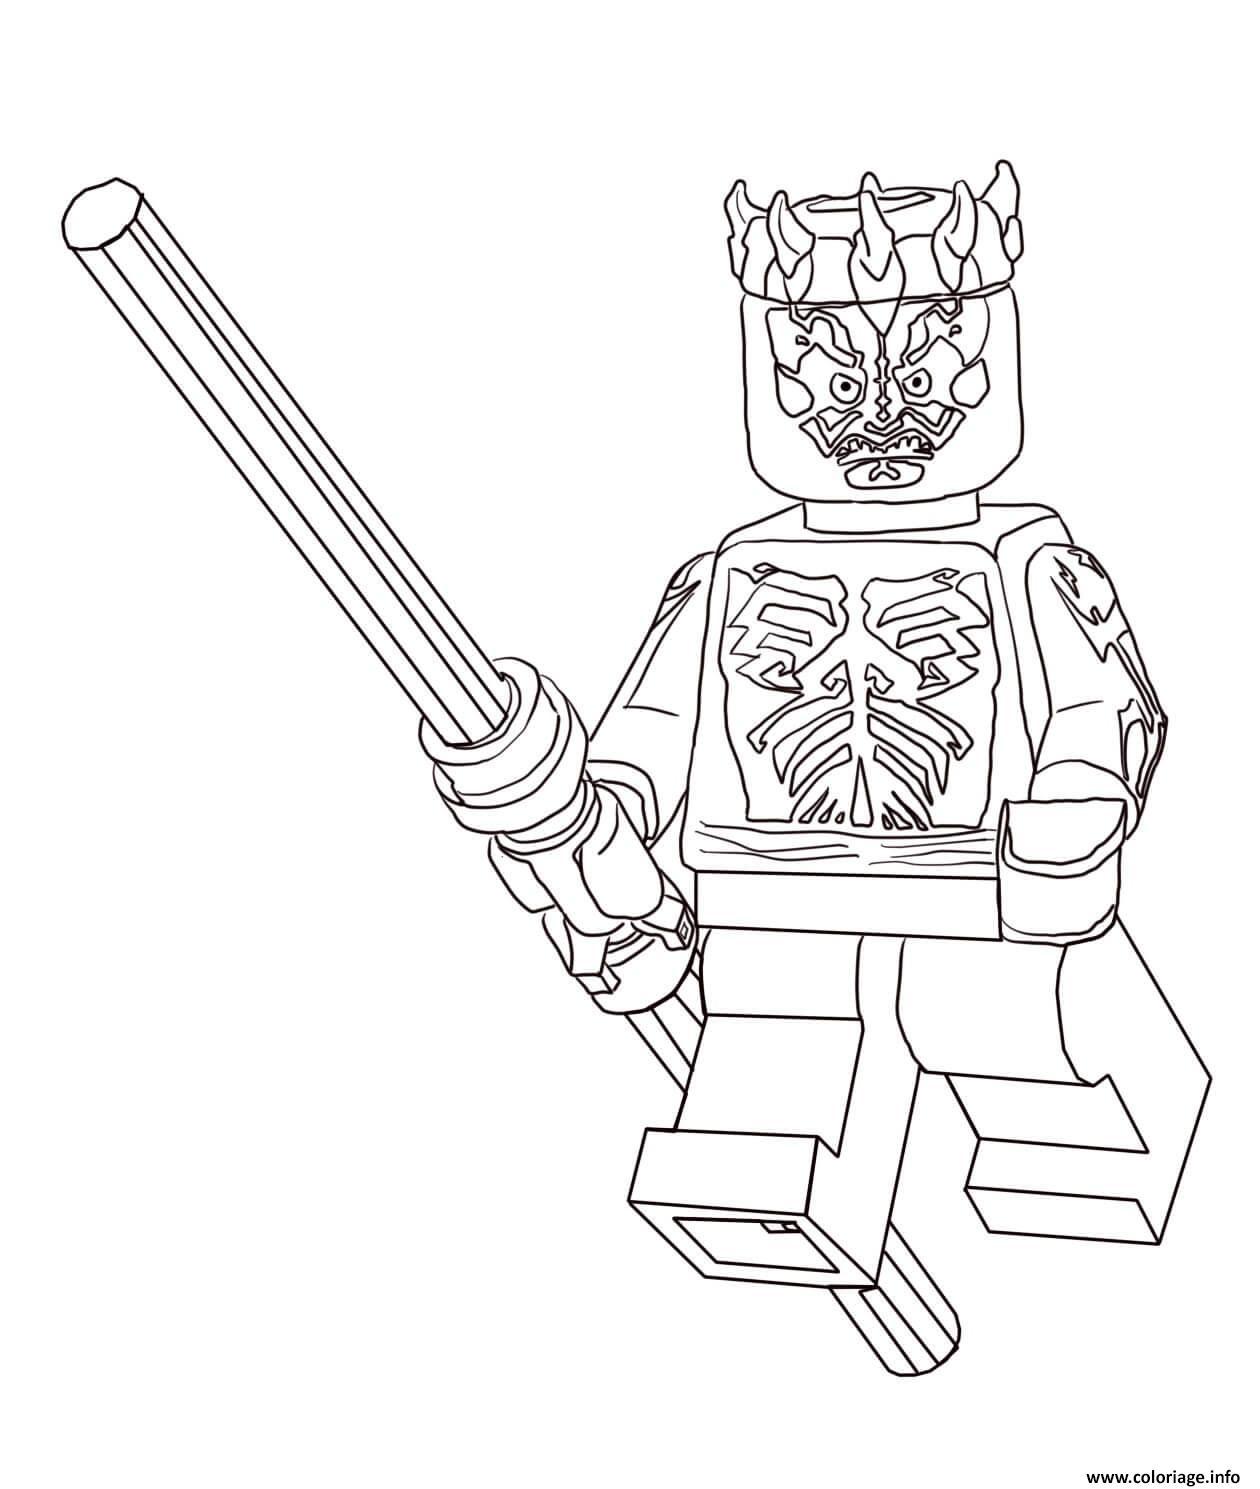 Coloriage Lego Star Wars Darth Maul dessin